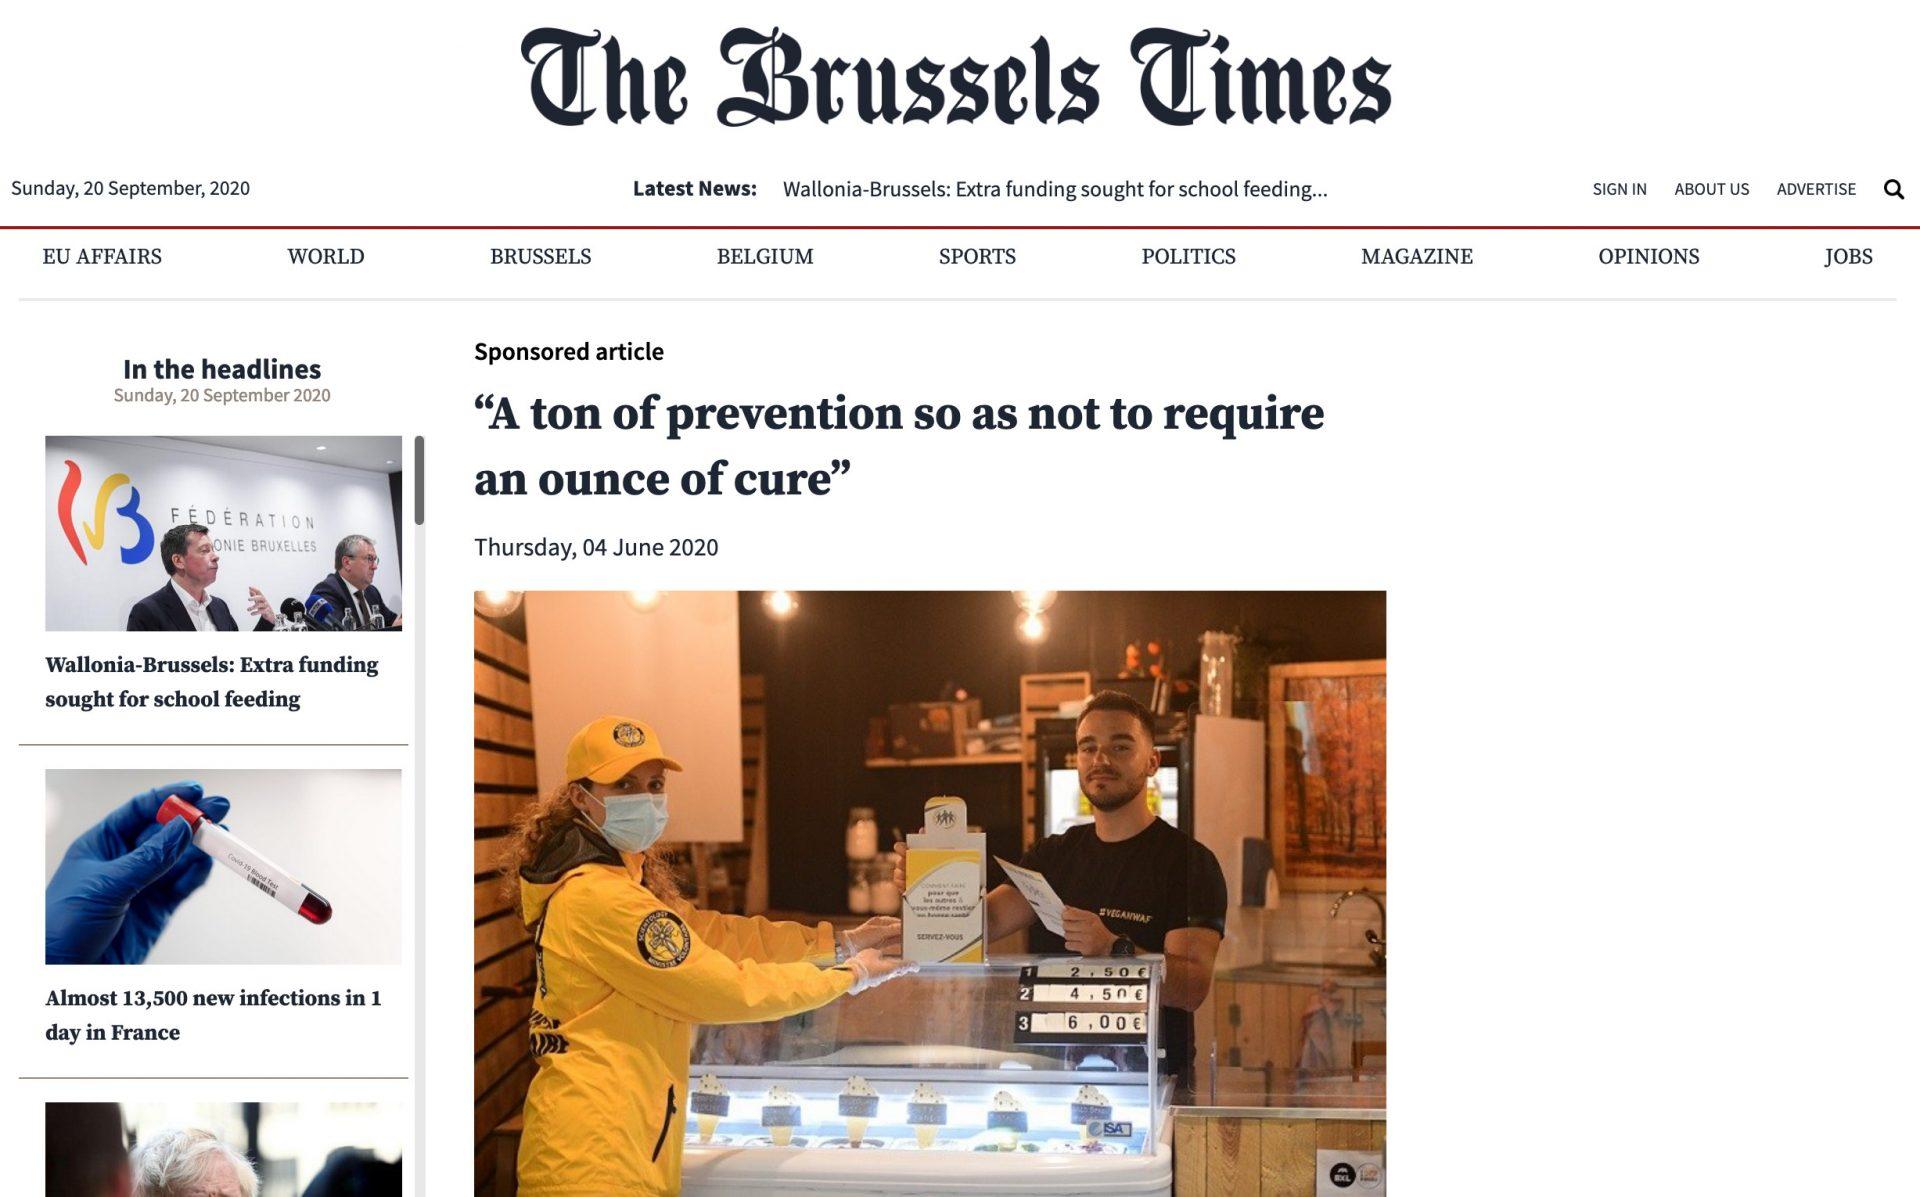 The Brussels Times - Ivan Arjona